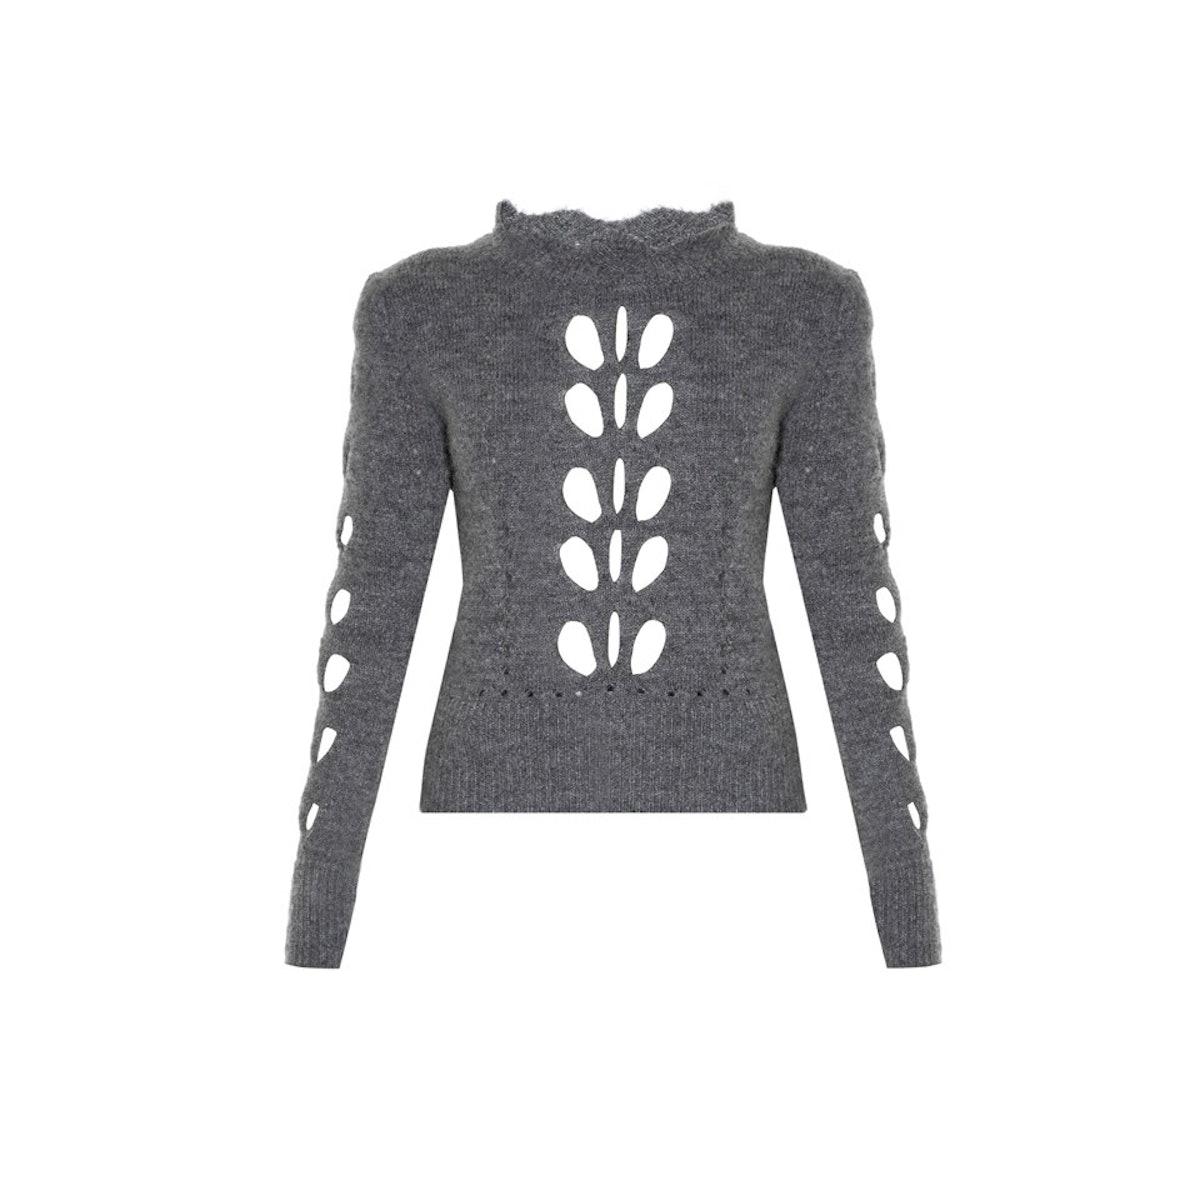 isabel marant sweater.jpg